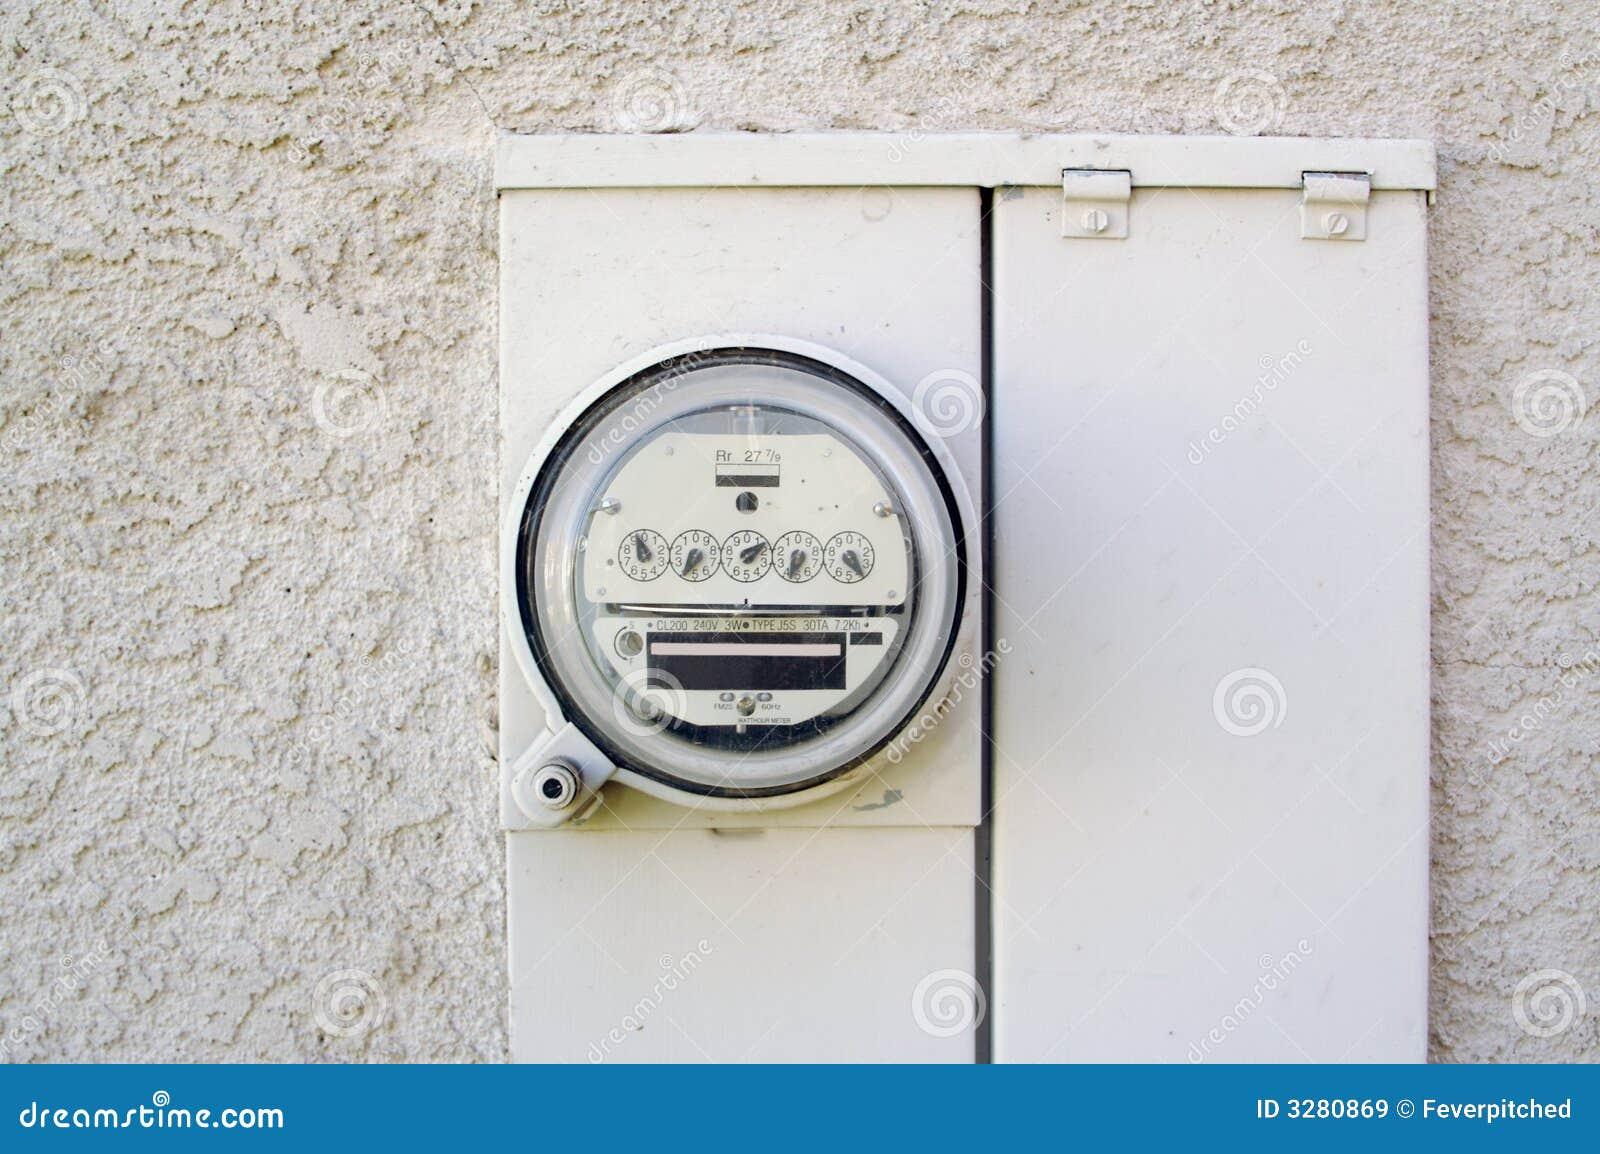 Hour Meters For Electrical Equipment : Electric watt hour meter stock image of